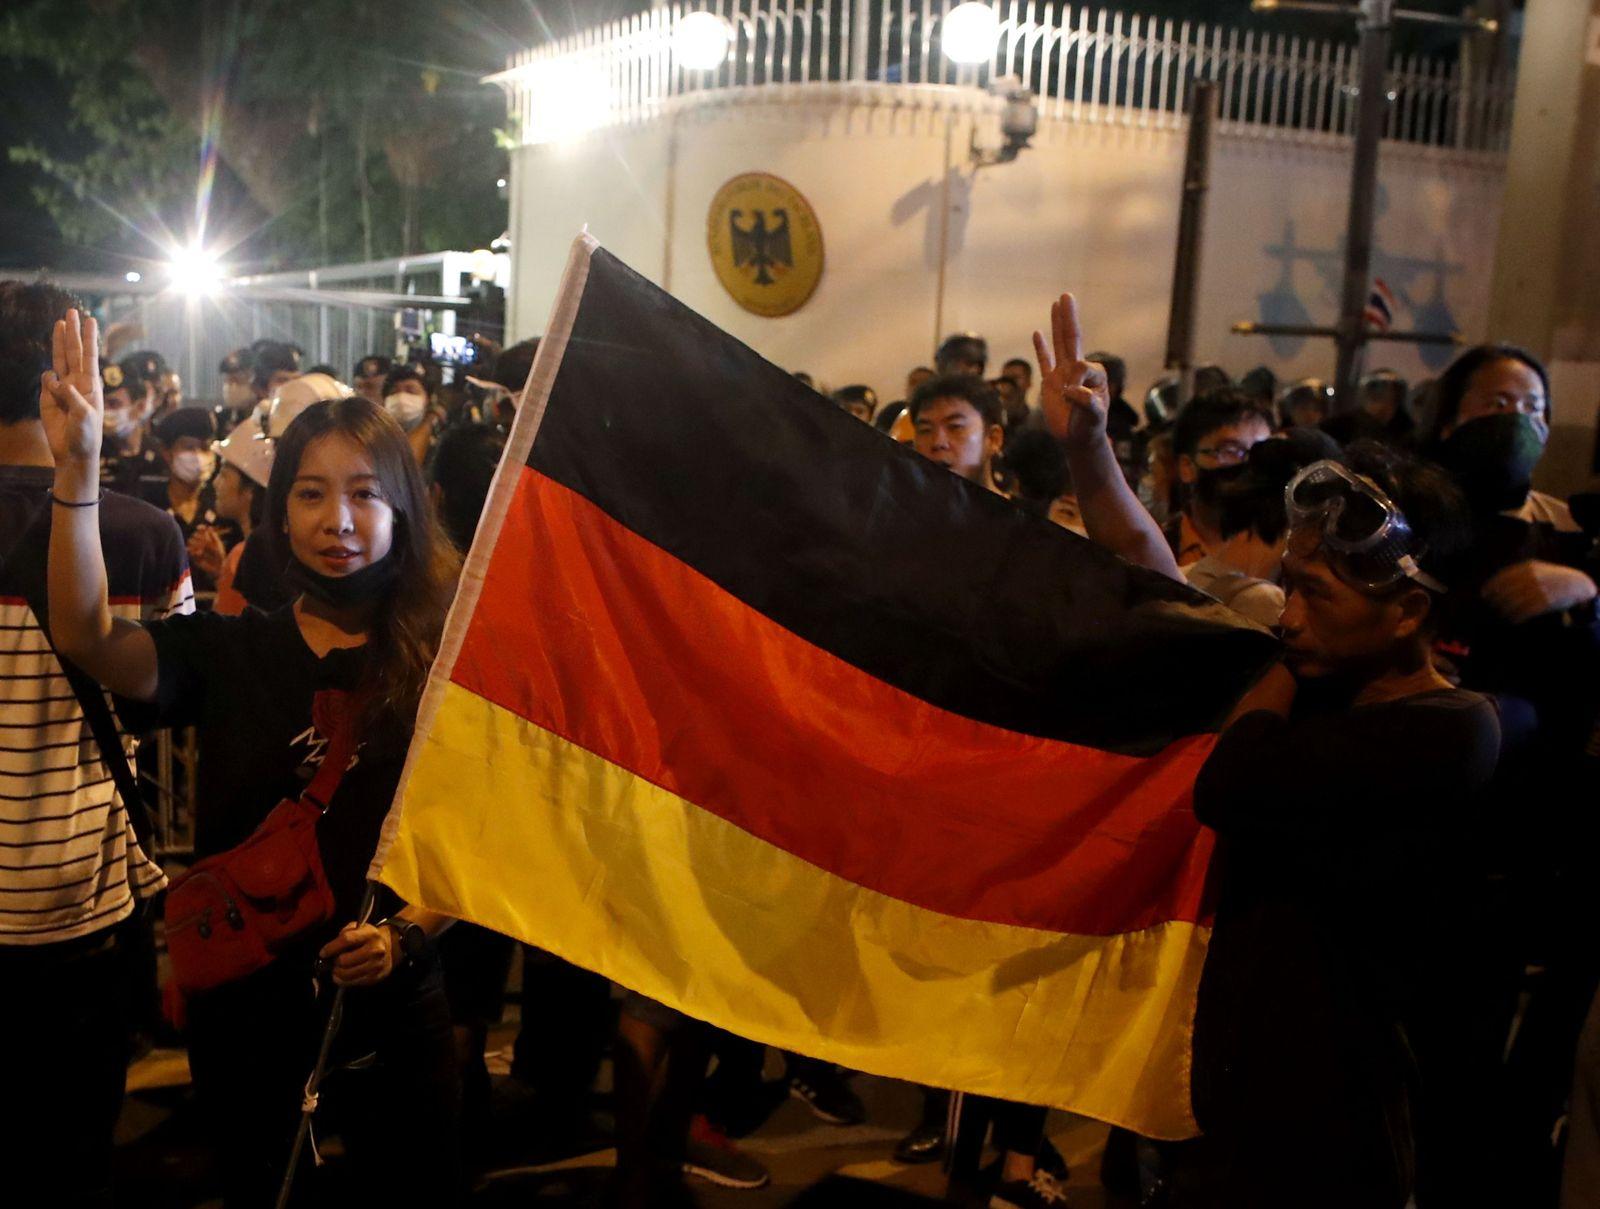 Pro-democracy demonstration at the German embassy in Bangkok, Thailand - 26 Oct 2020